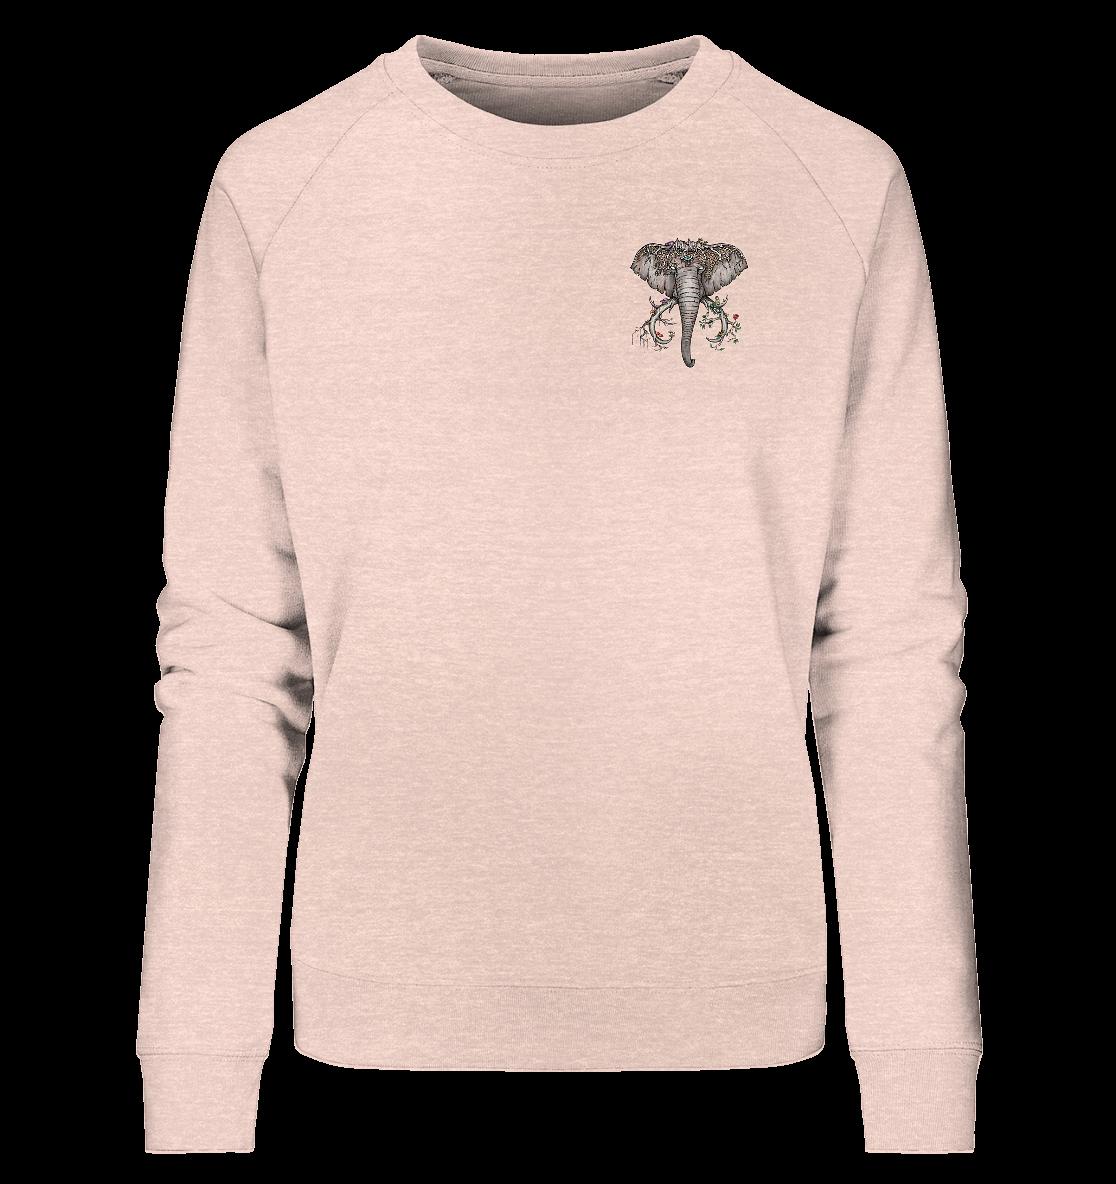 front-ladies-organic-sweatshirt-ffded6-1116x-3.png